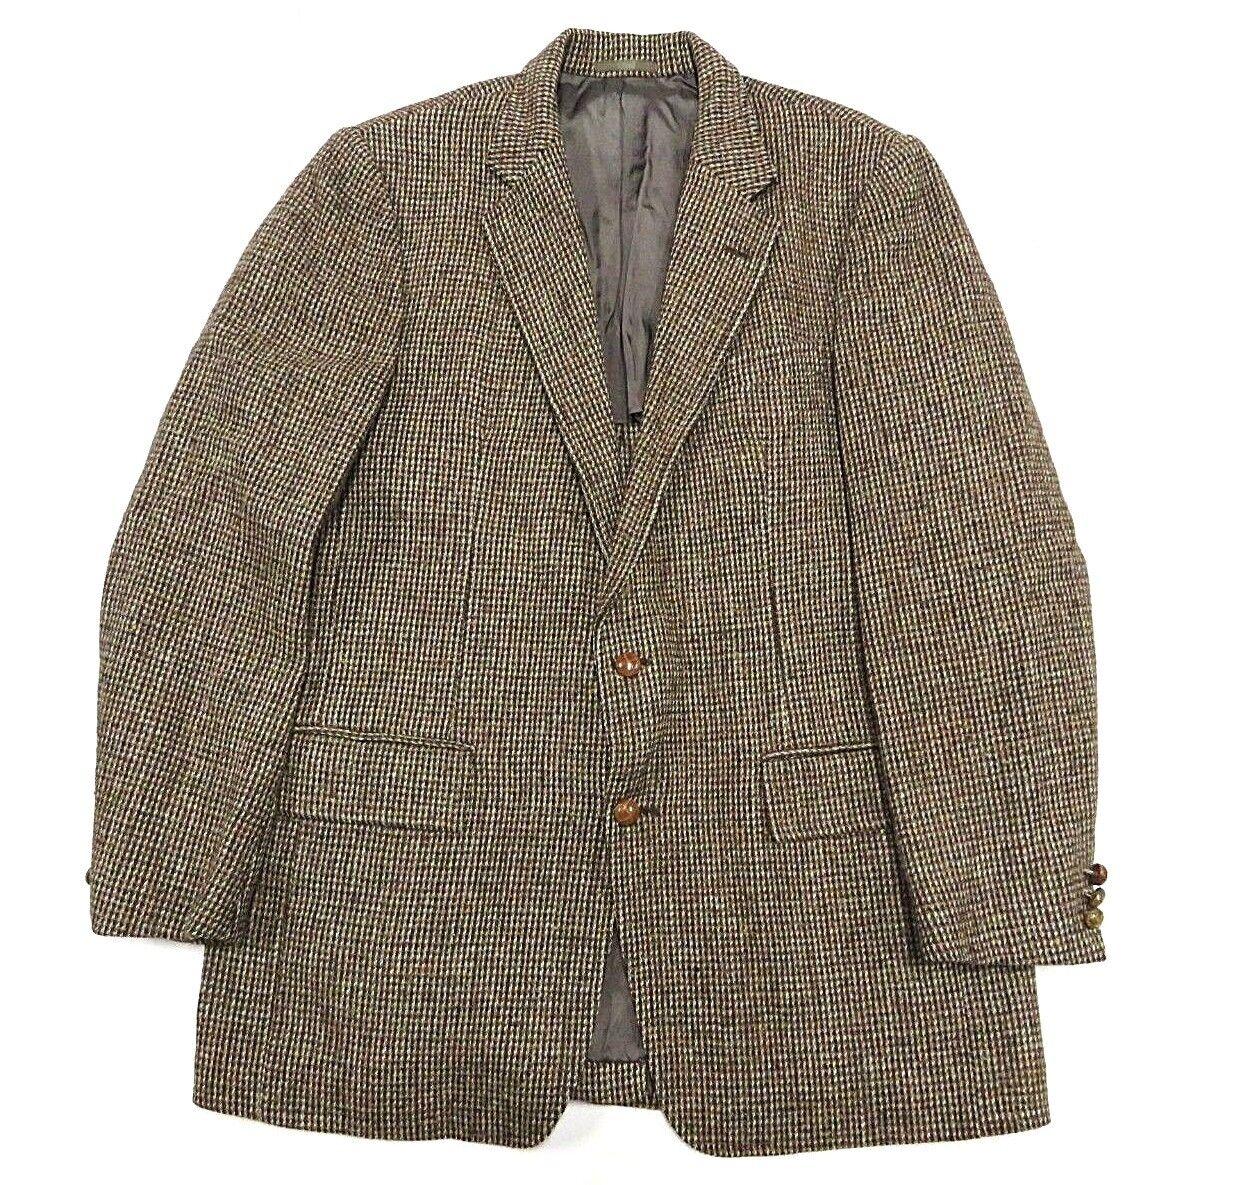 VTG Harris Tweed 100% Pure Scottish Wool Tailored in USA Men's Two Button Blazer